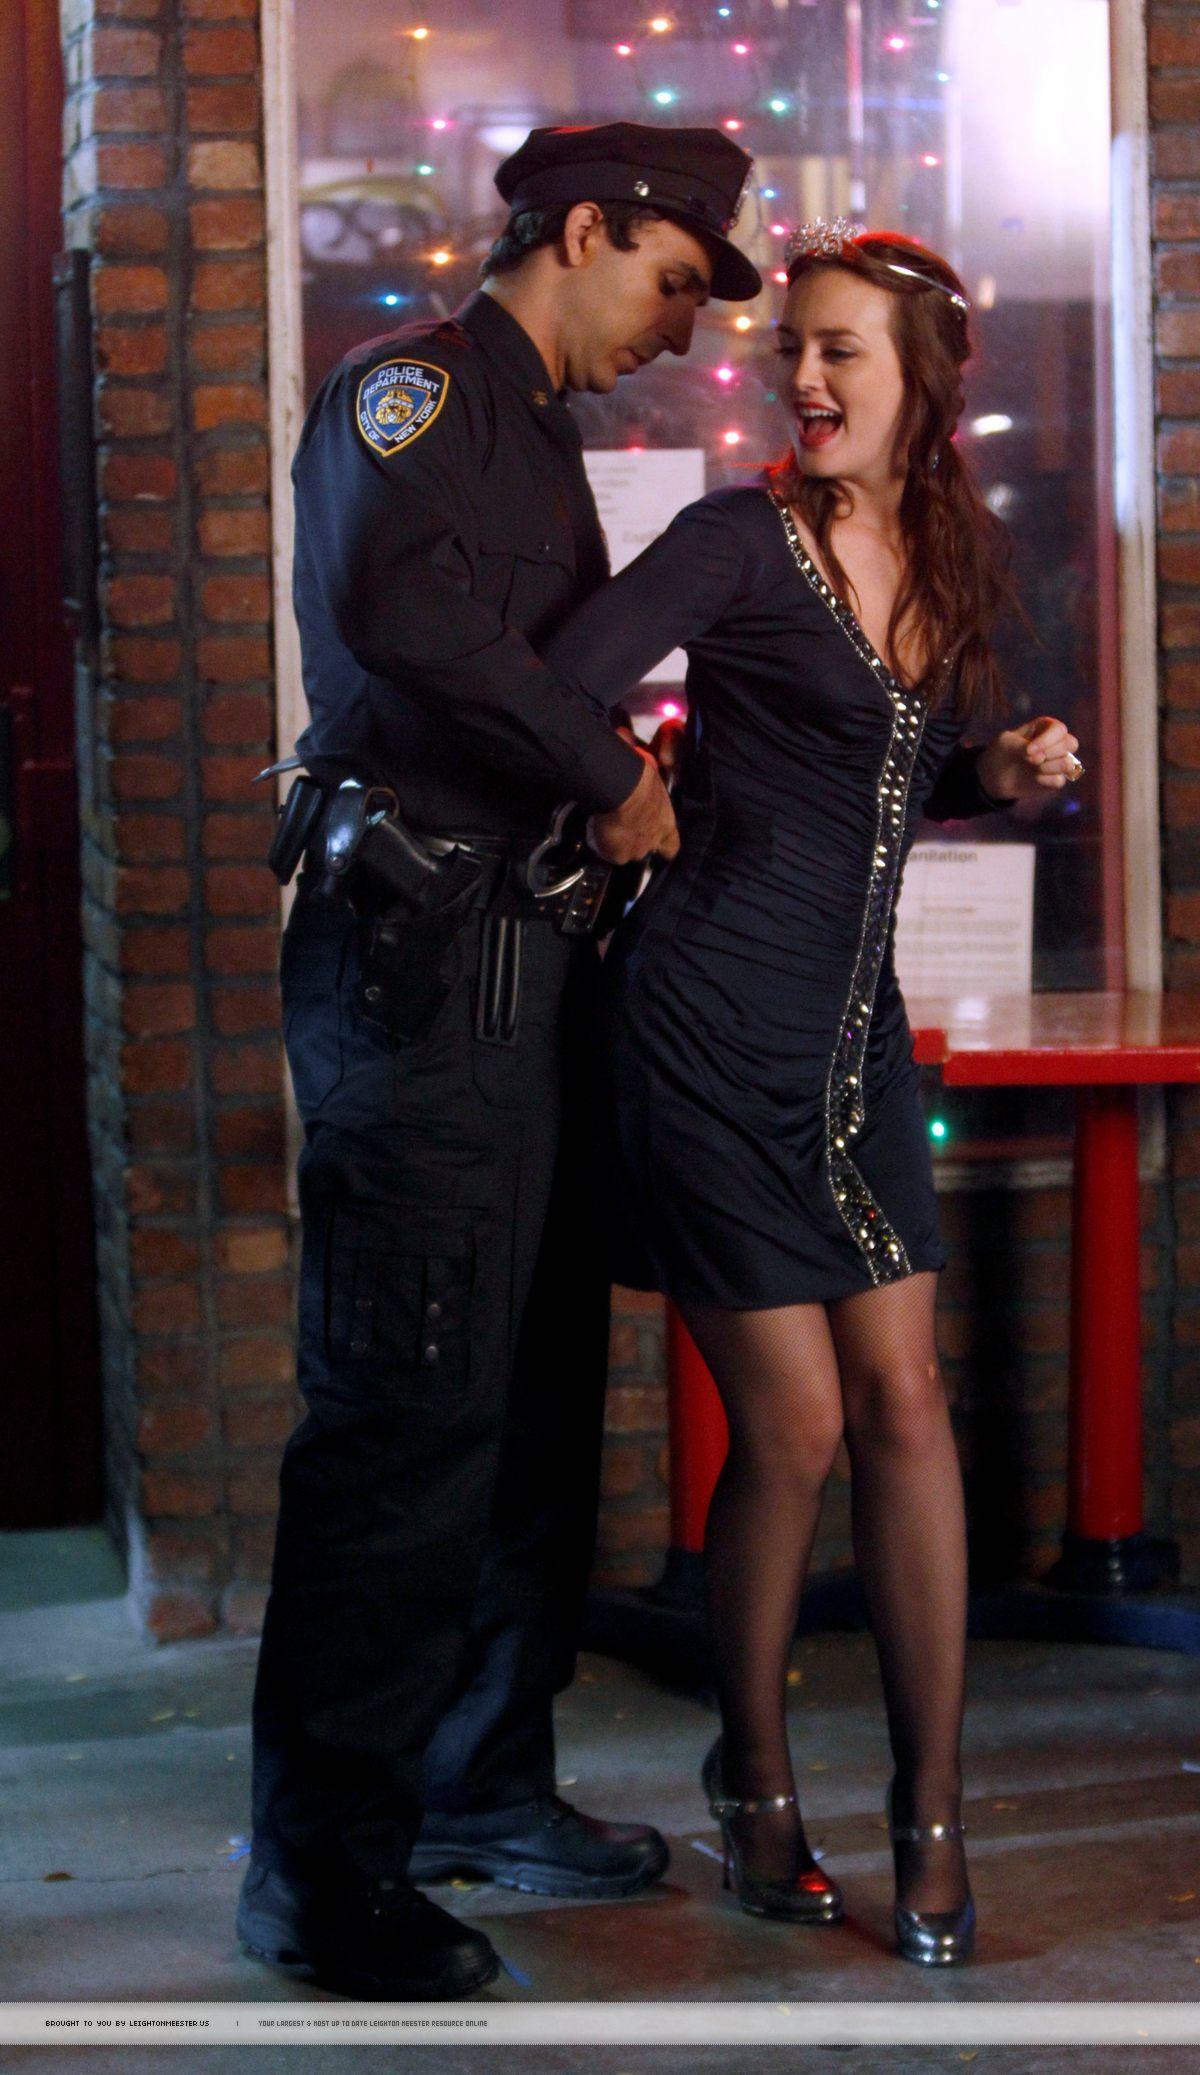 Gossip Girl - Blair Waldorf getting arrested at her Bachelorette ...